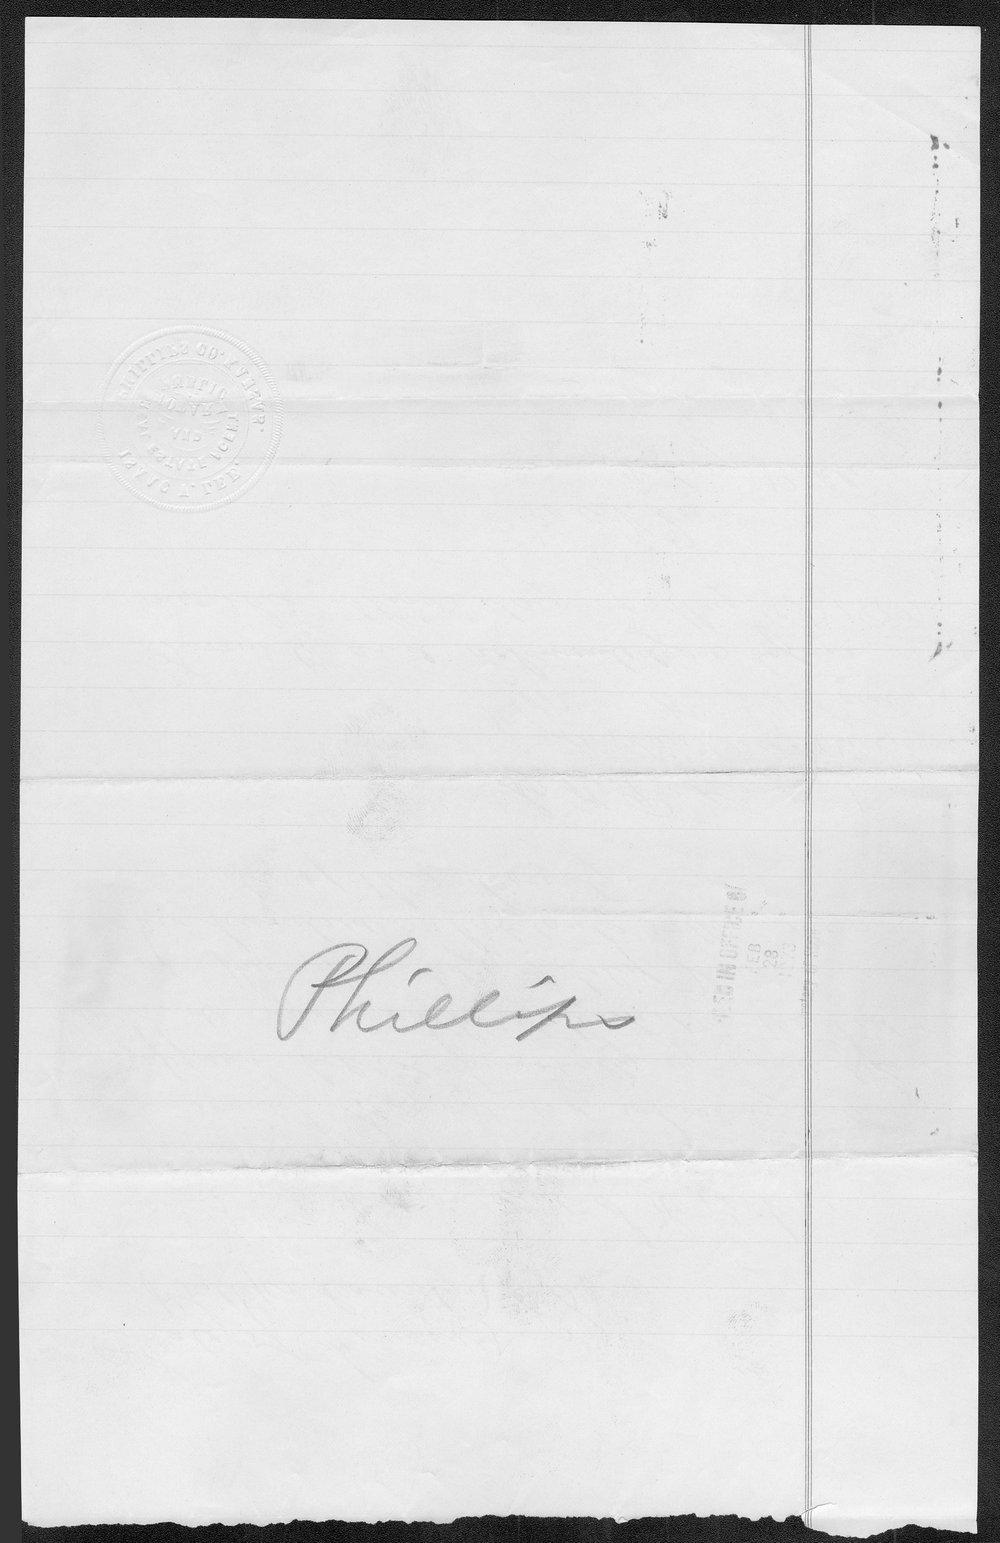 Phillips County organization records - 2